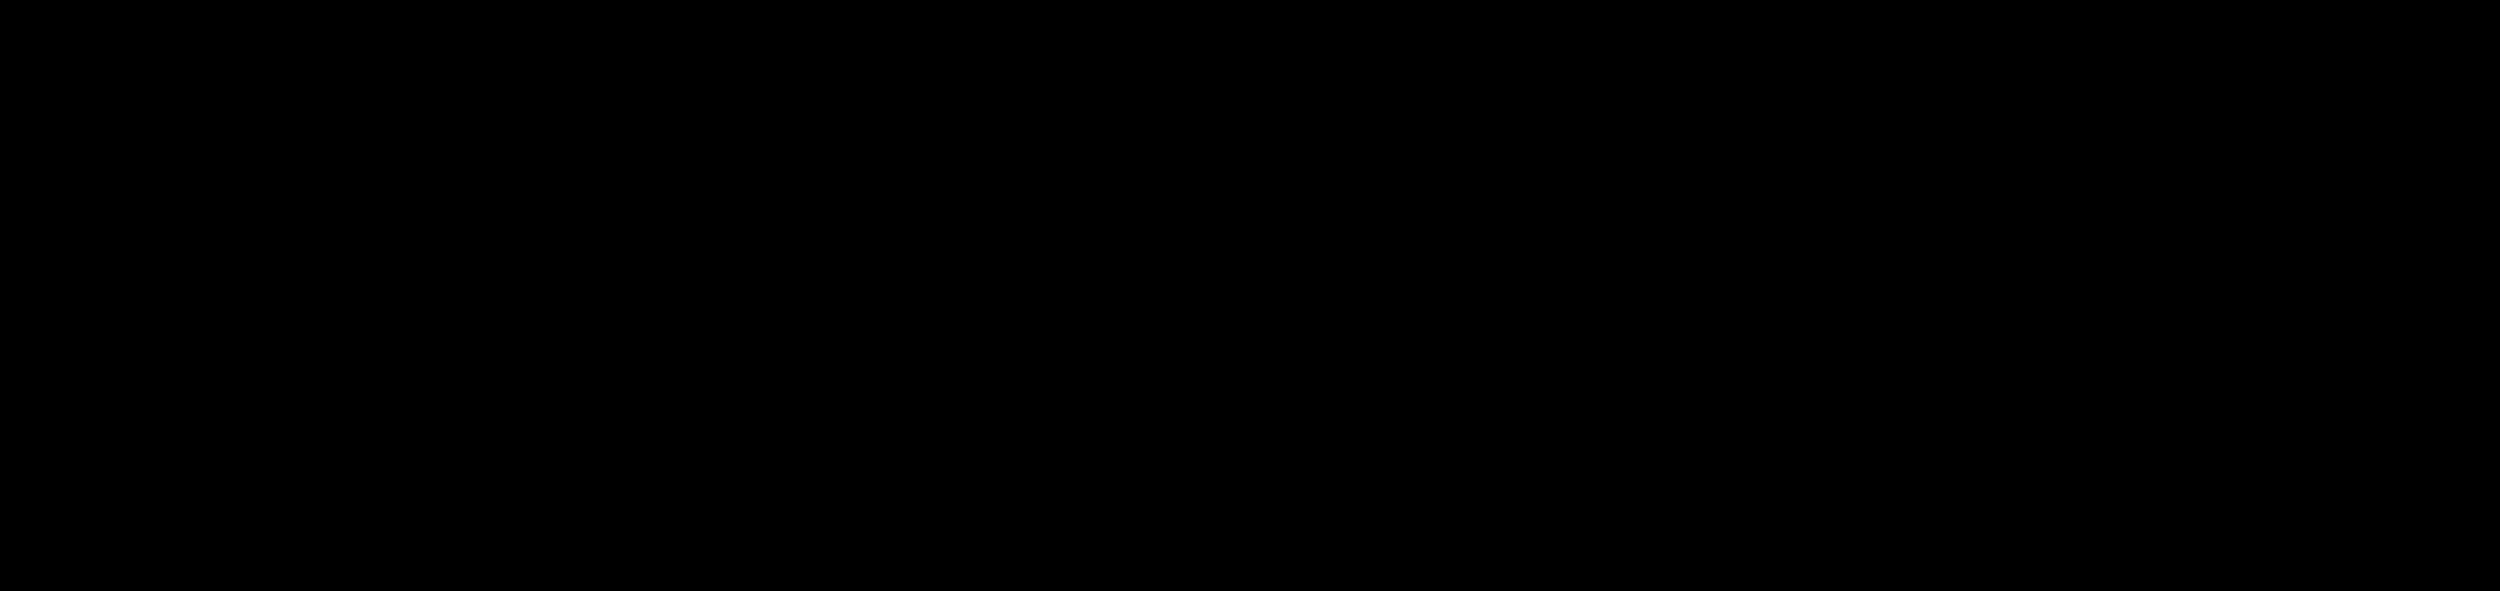 DIY_Network_logo.png